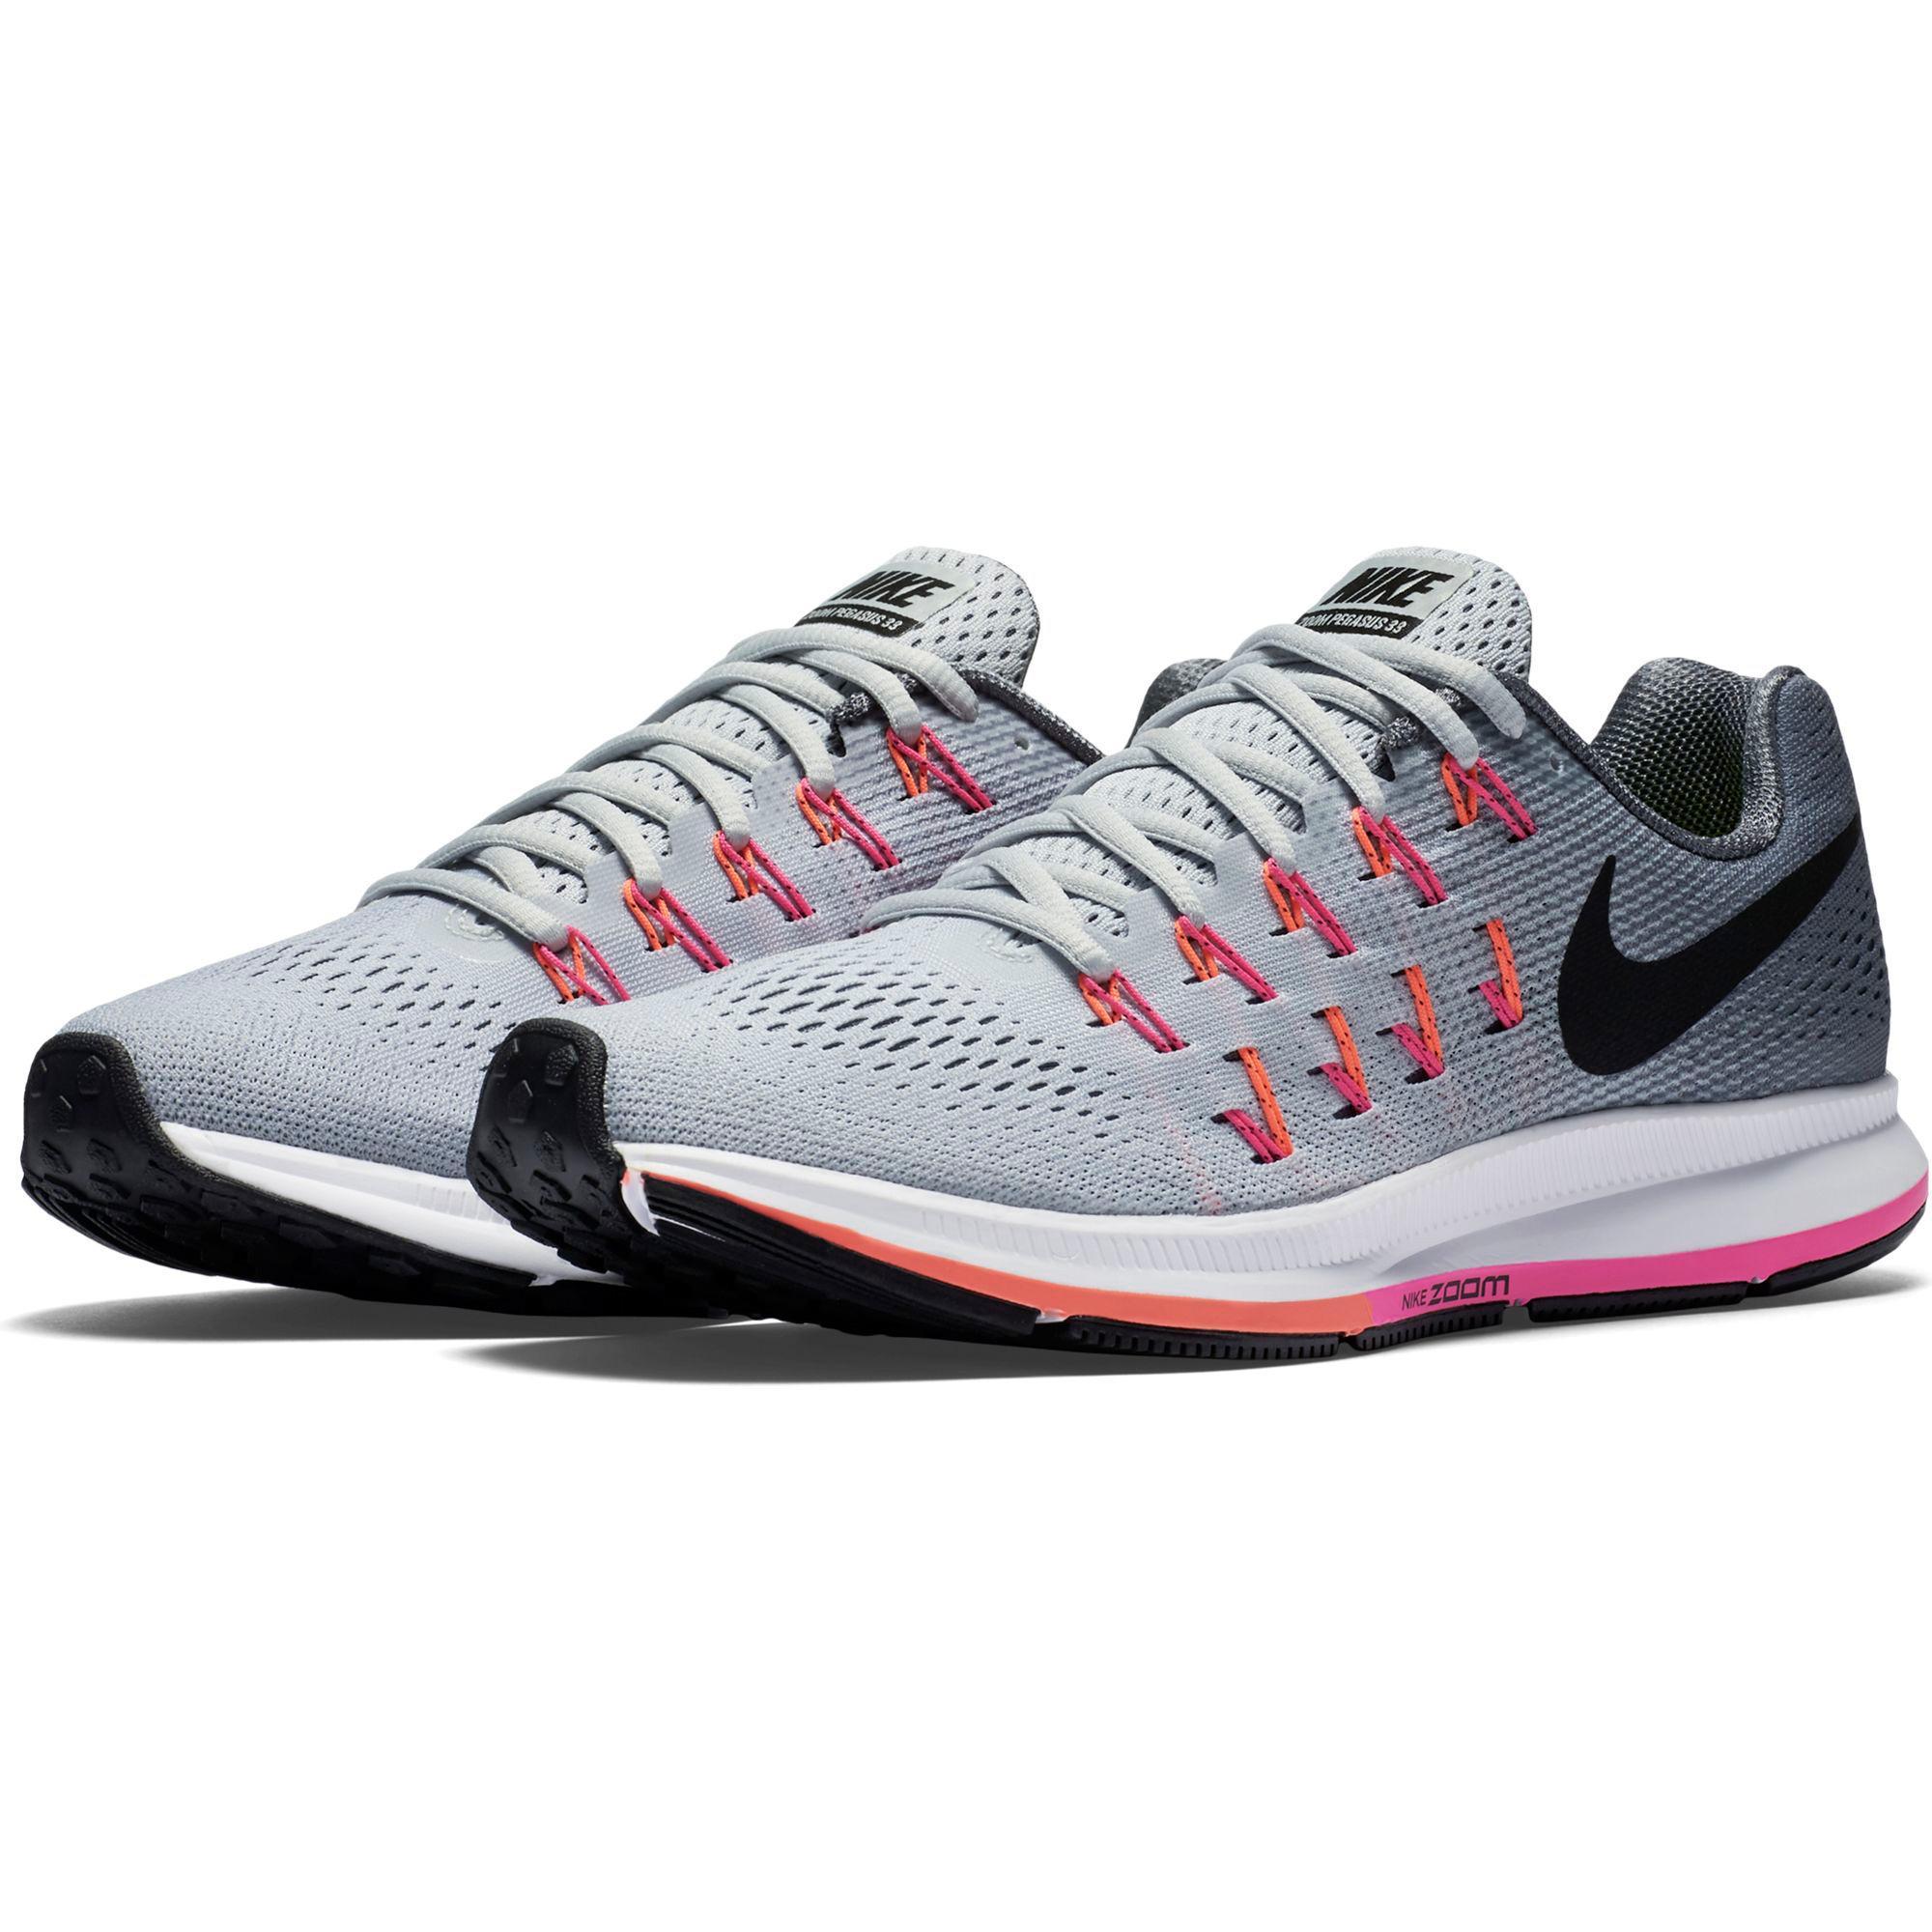 nike womens air zoom pegasus 33 running shoes grey pink. Black Bedroom Furniture Sets. Home Design Ideas